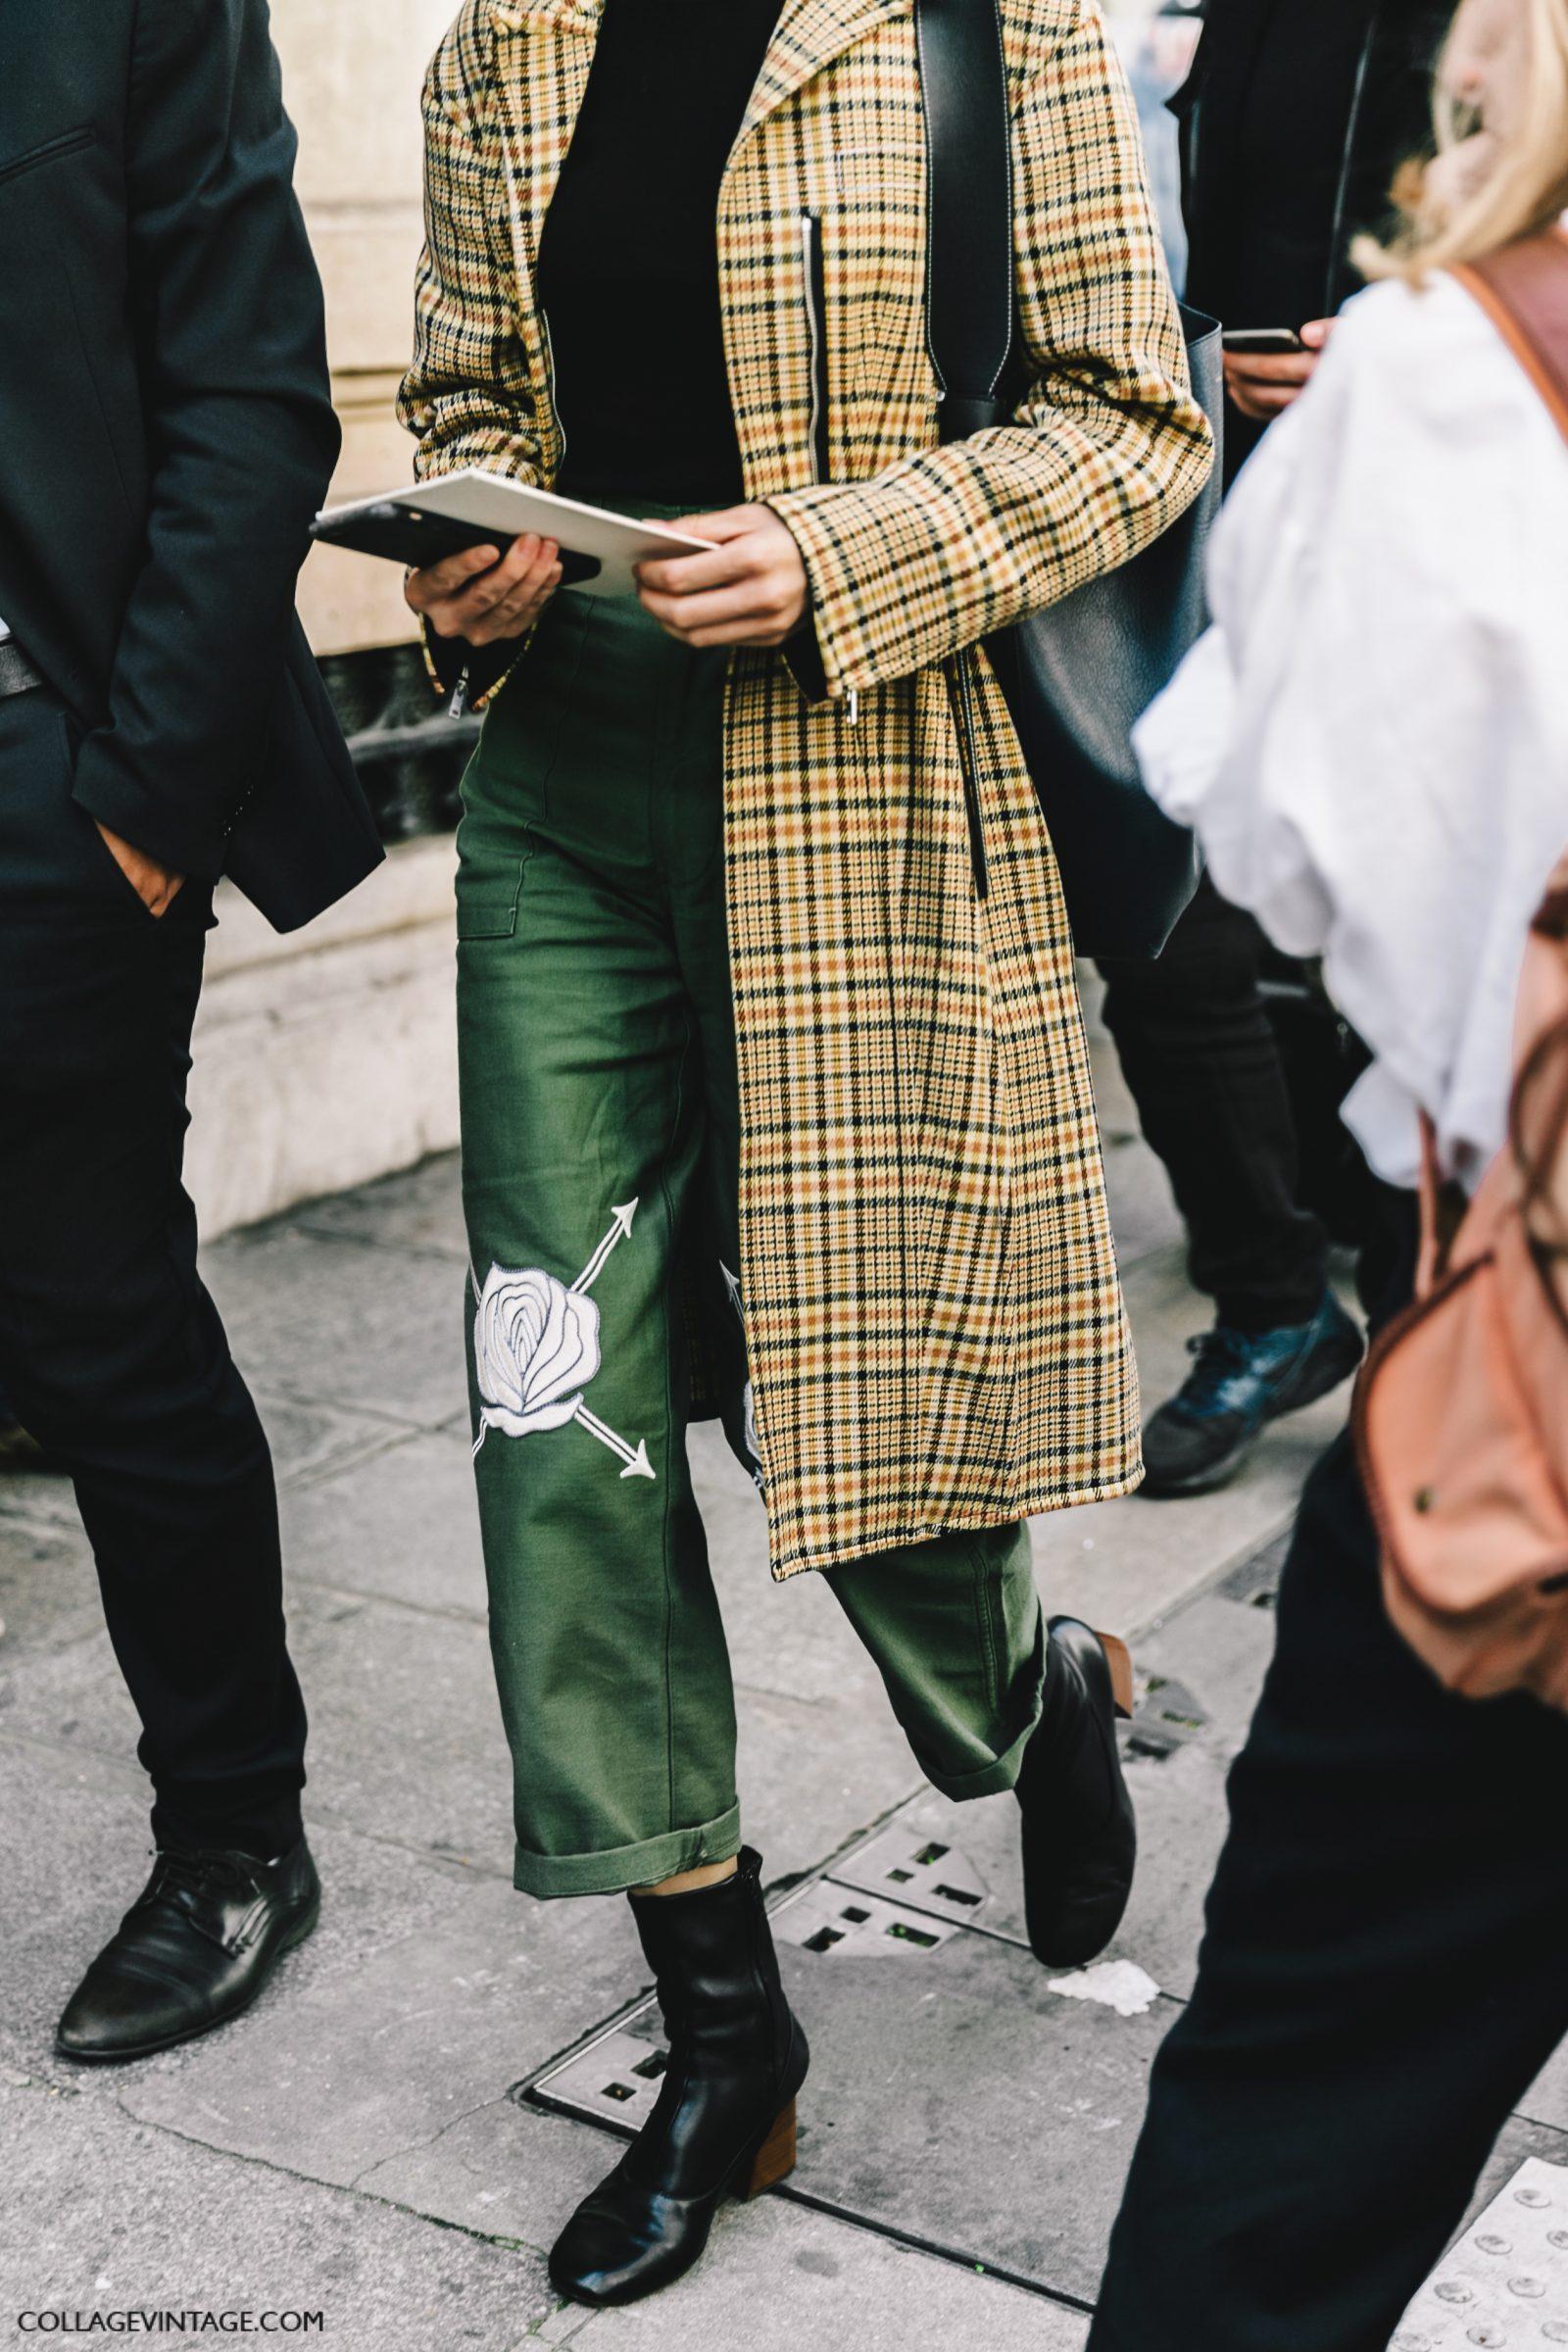 pfw-paris_fashion_week_ss17-street_style-outfits-collage_vintage-valentino-balenciaga-celine-122